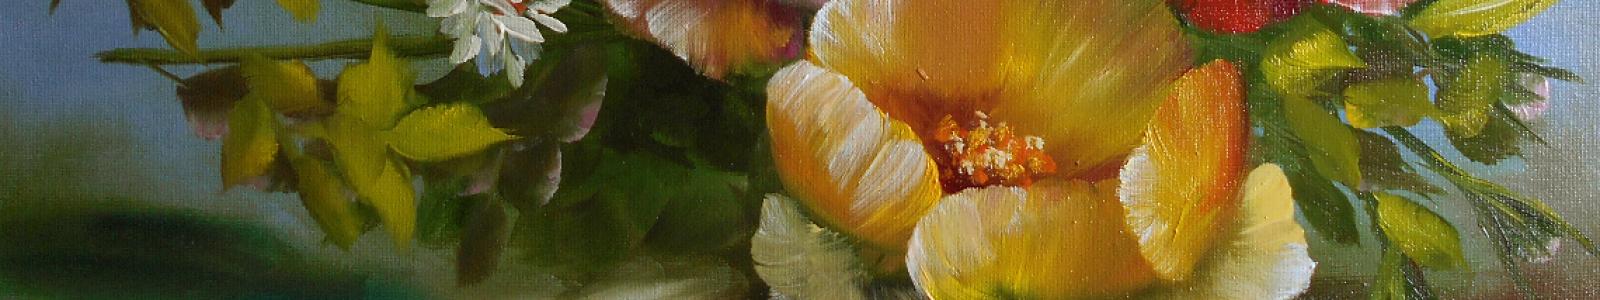 Gallery Painter Tanya Vesta